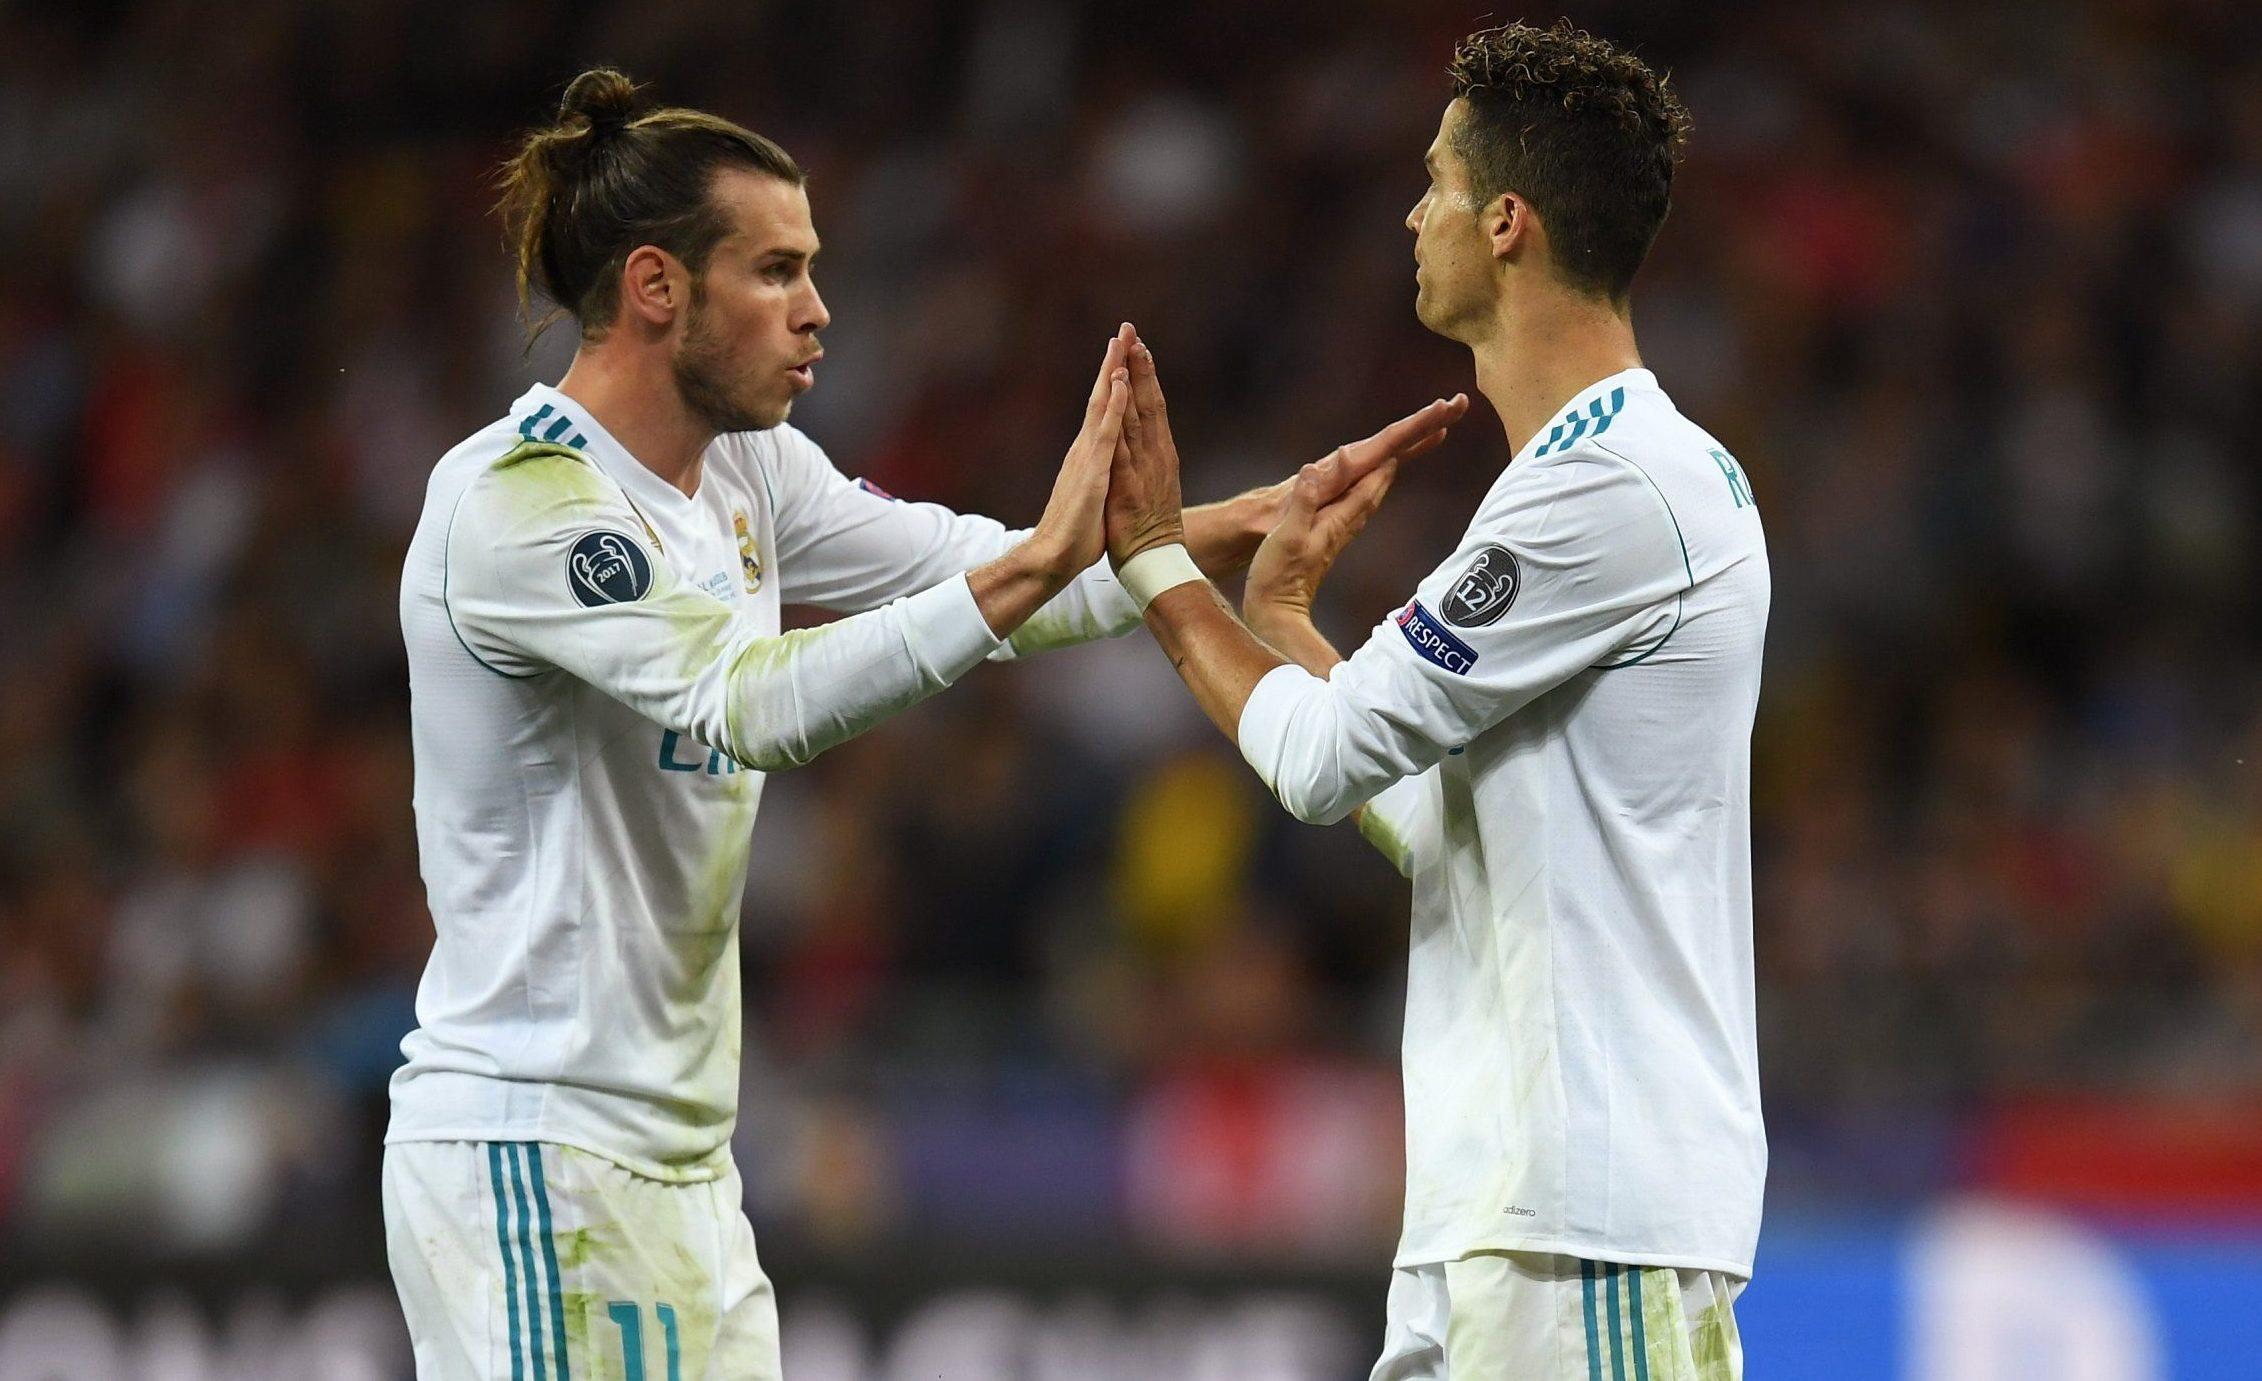 Cristiano Ronaldo caught admiring Gareth Bale's wonder goal vs Liverpool